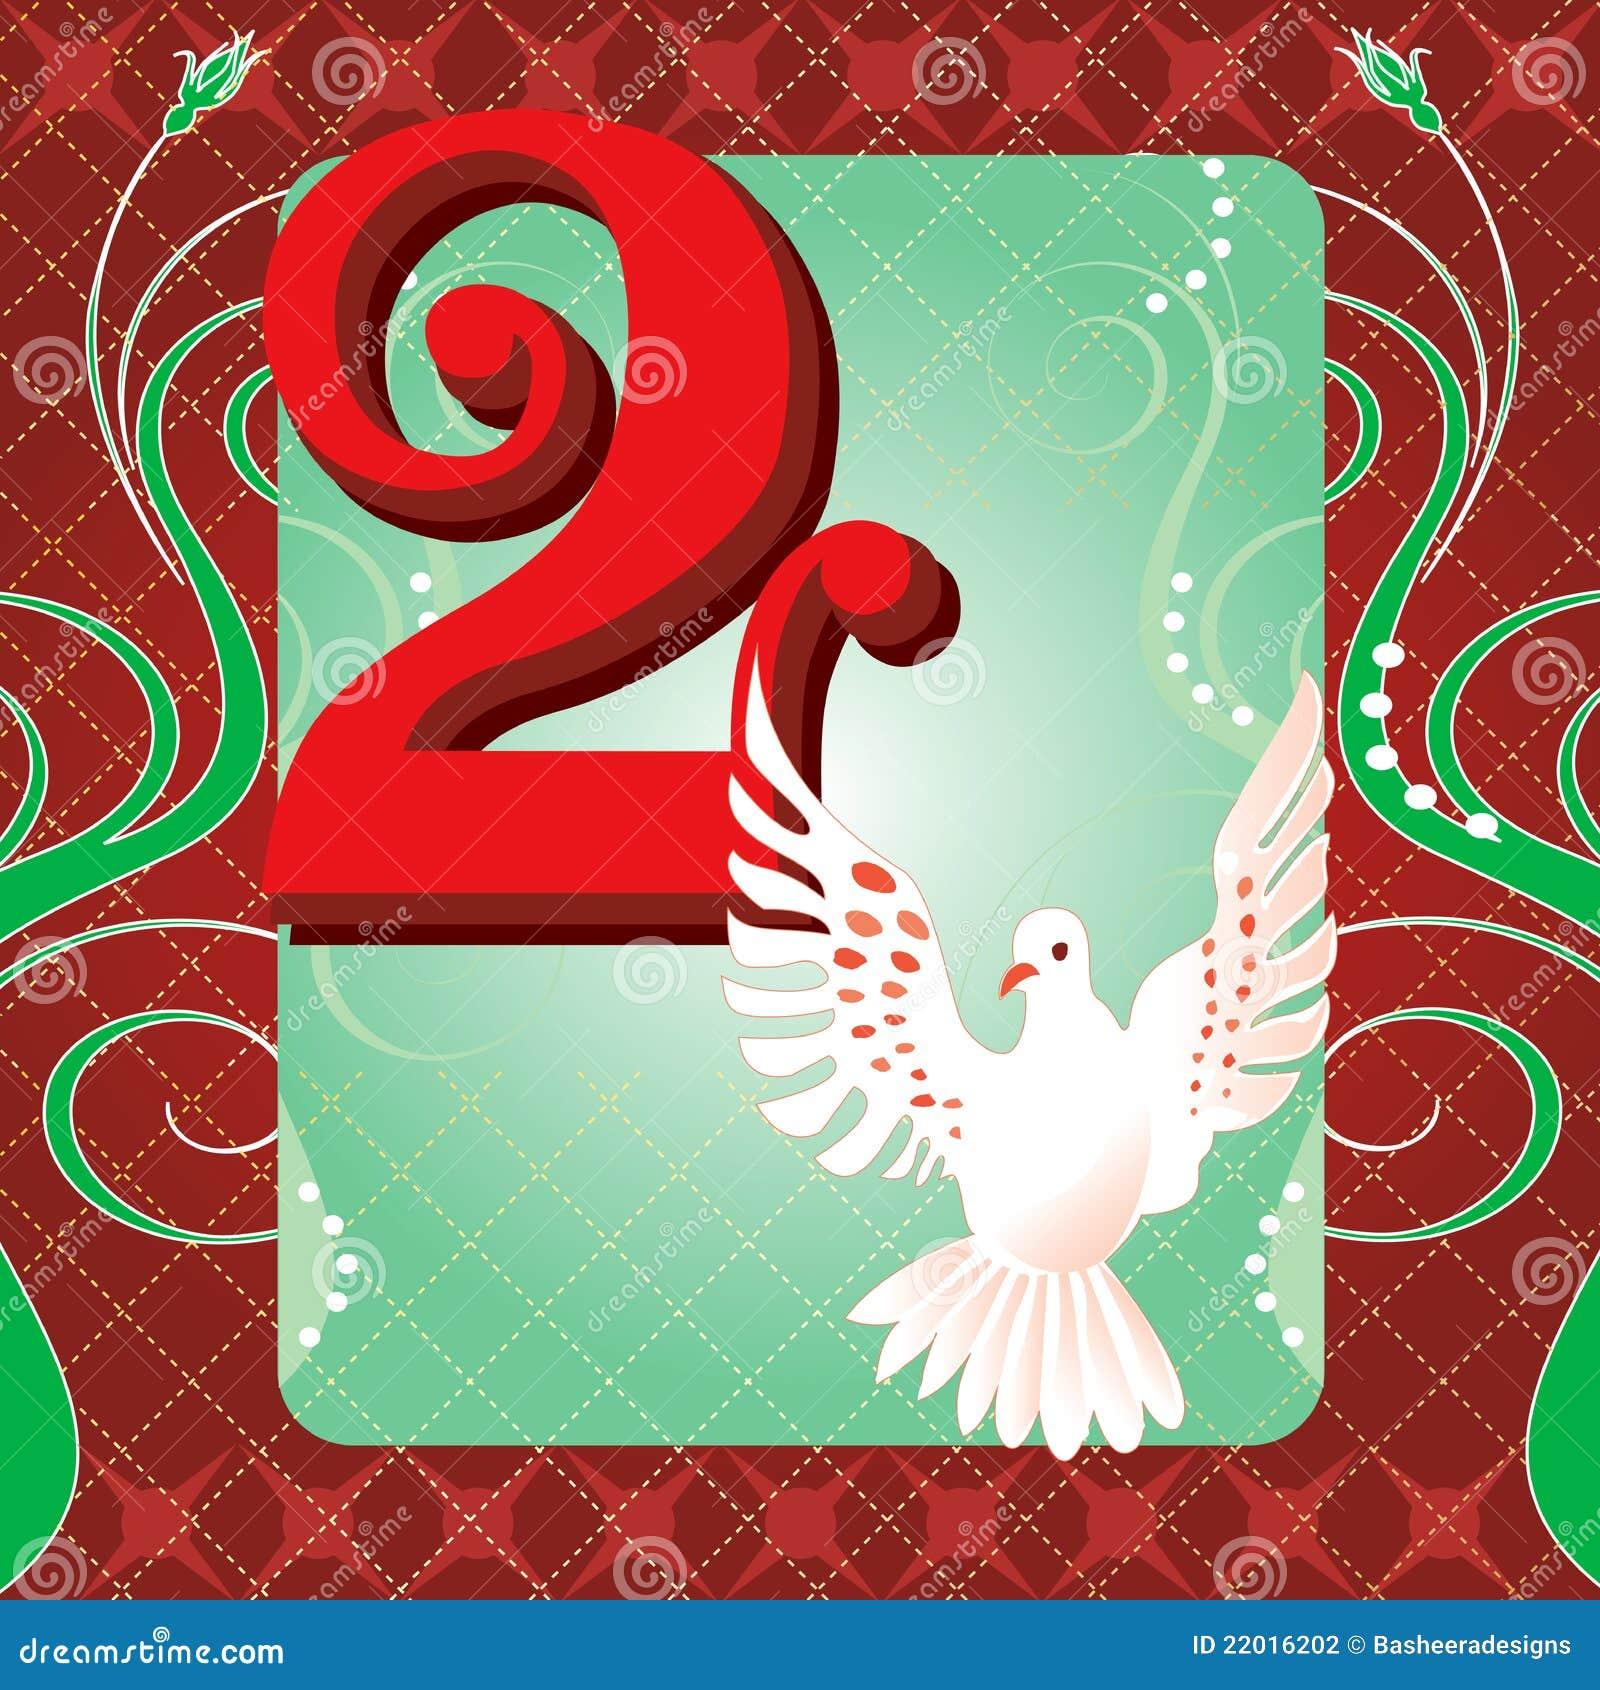 2nd Day Of Christmas Stock Photography Image 22016202